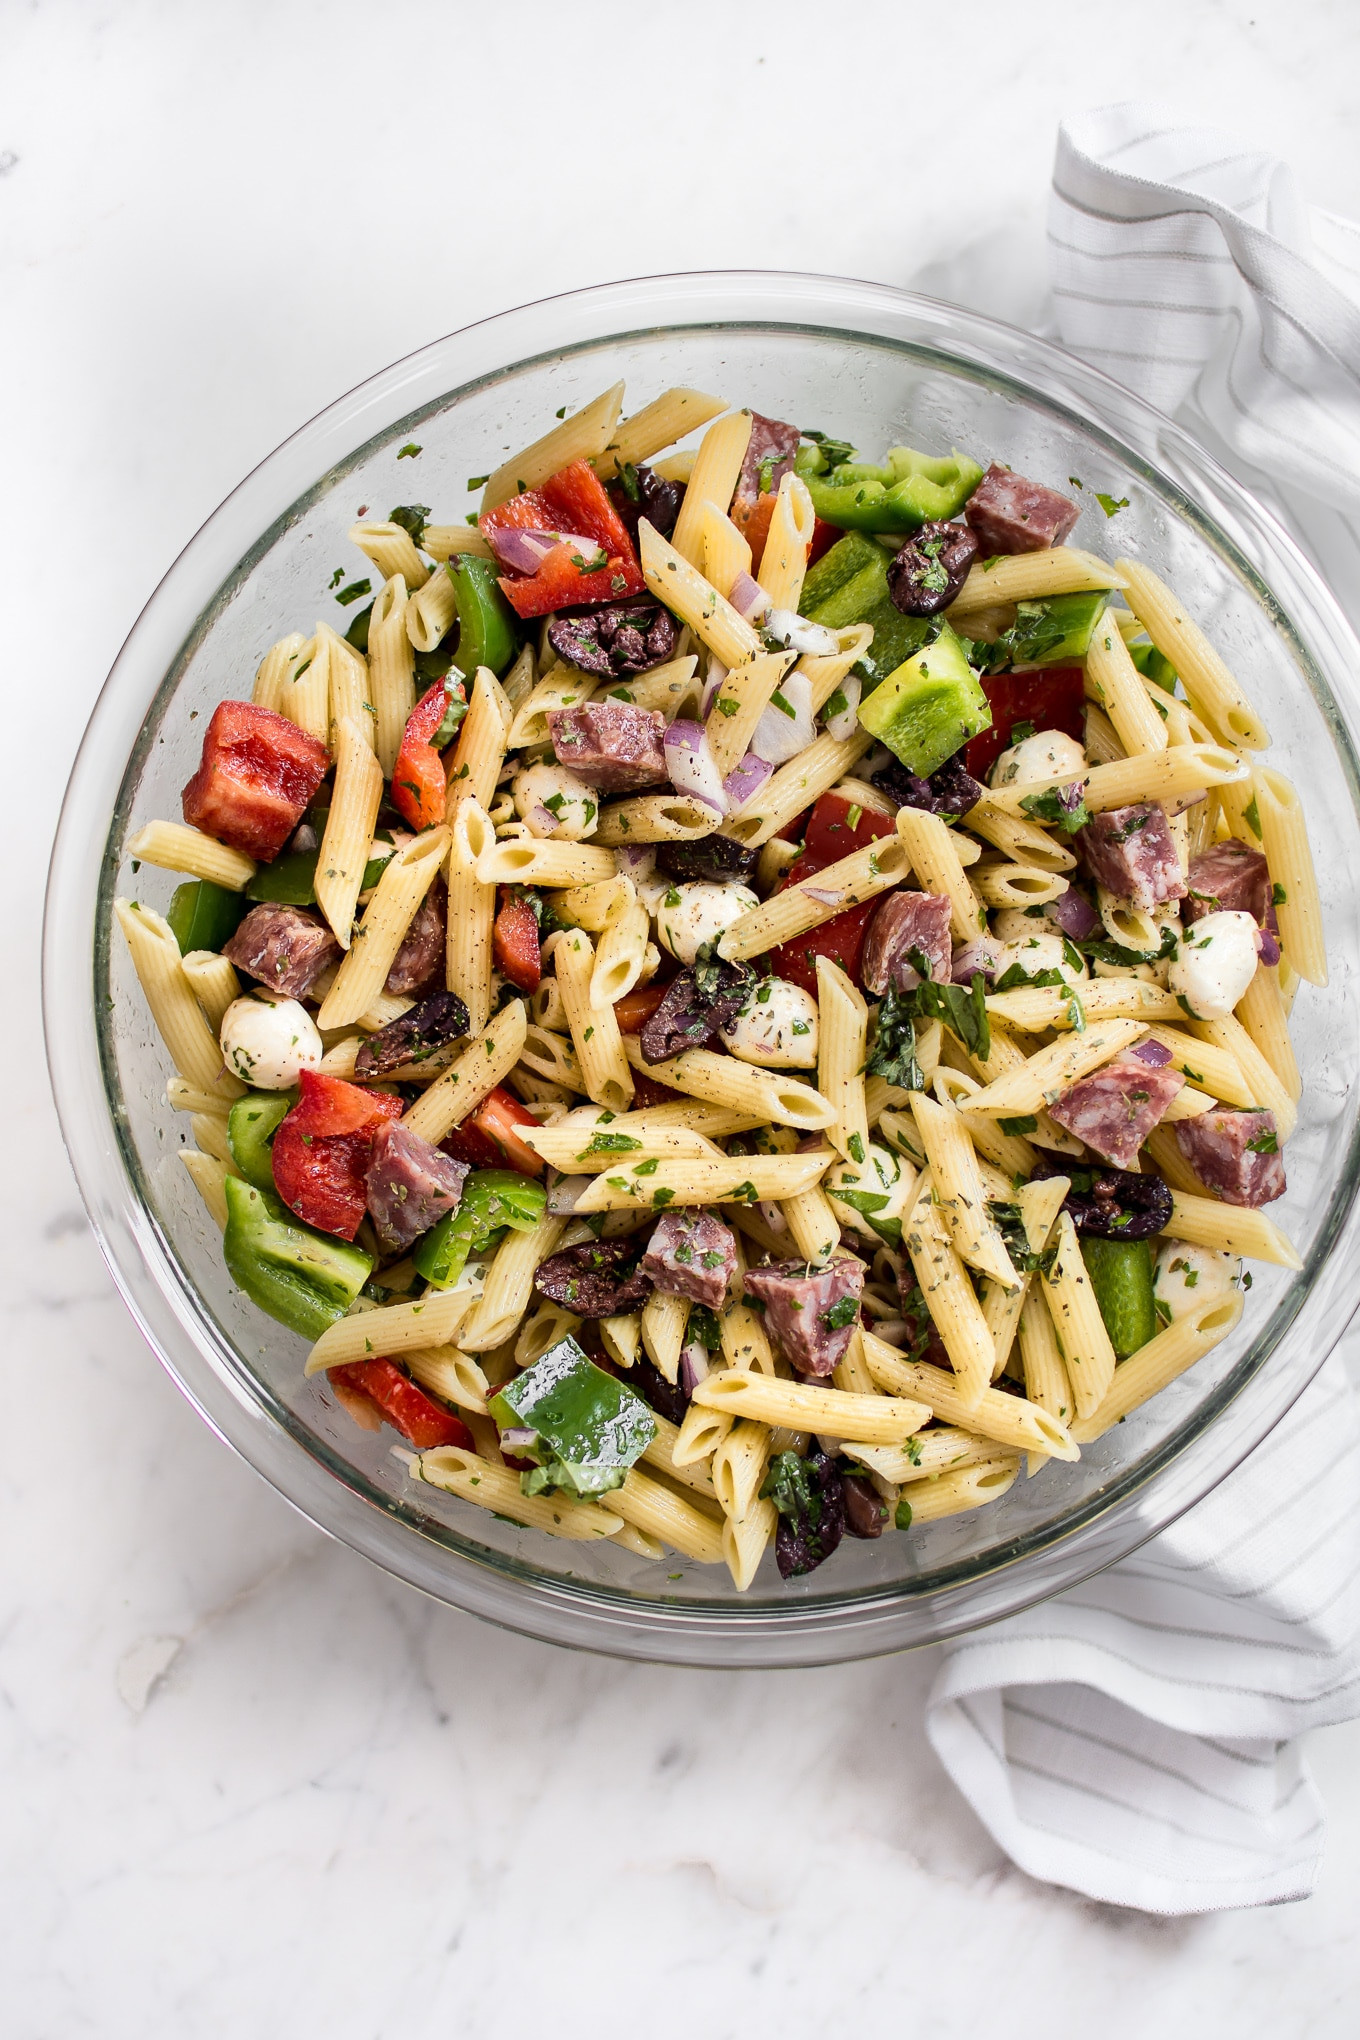 Healthy Italian Recipes  Easy Italian Pasta Salad Recipe • Salt & Lavender